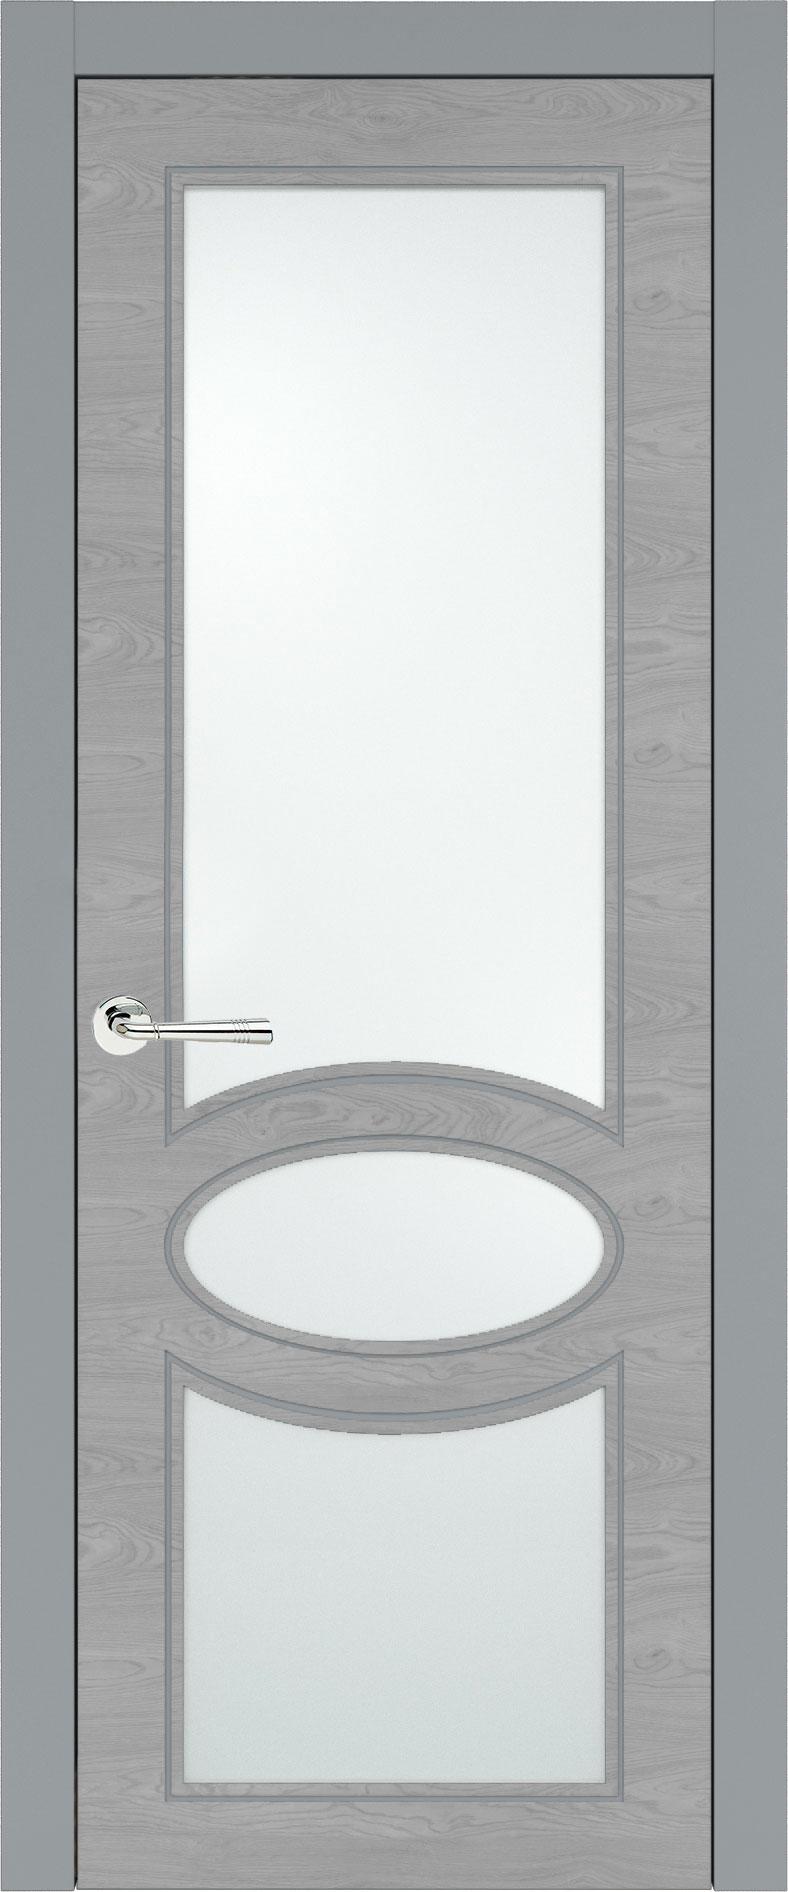 Florencia Neo Classic цвет - Серебристо-серая эмаль по шпону (RAL 7045) Со стеклом (ДО)